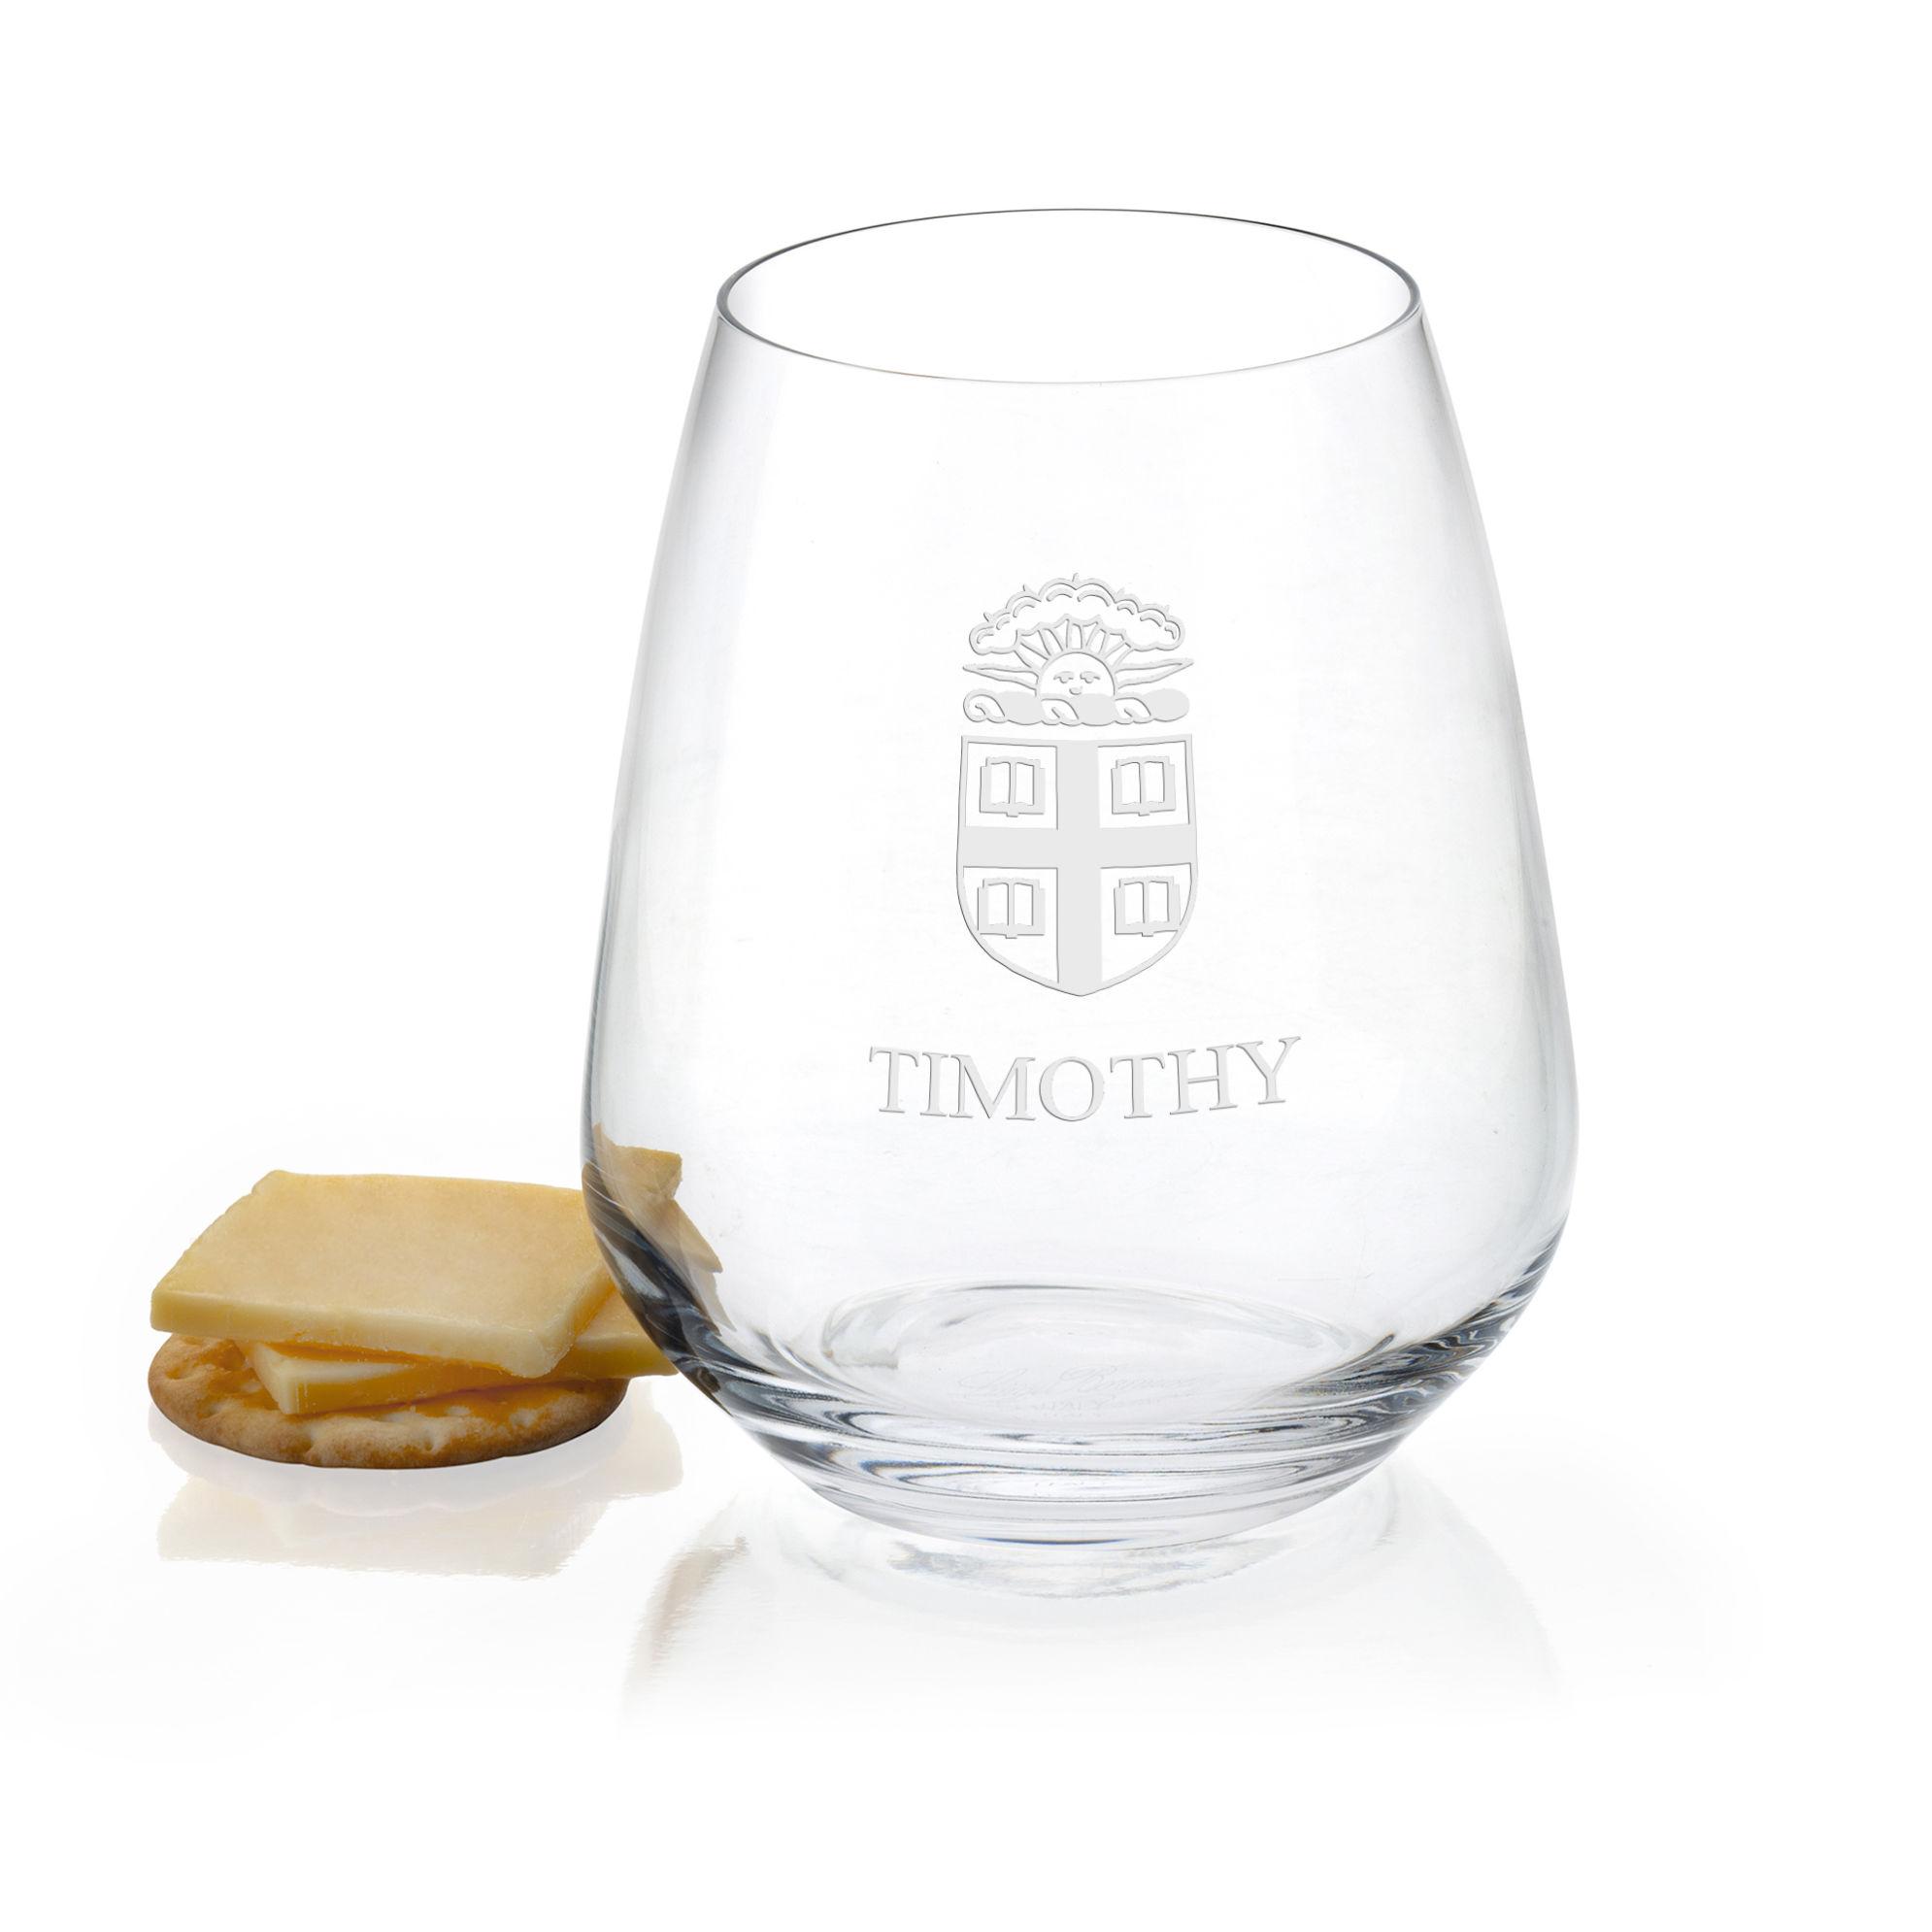 Brown University Stemless Wine Glasses - Set of 4